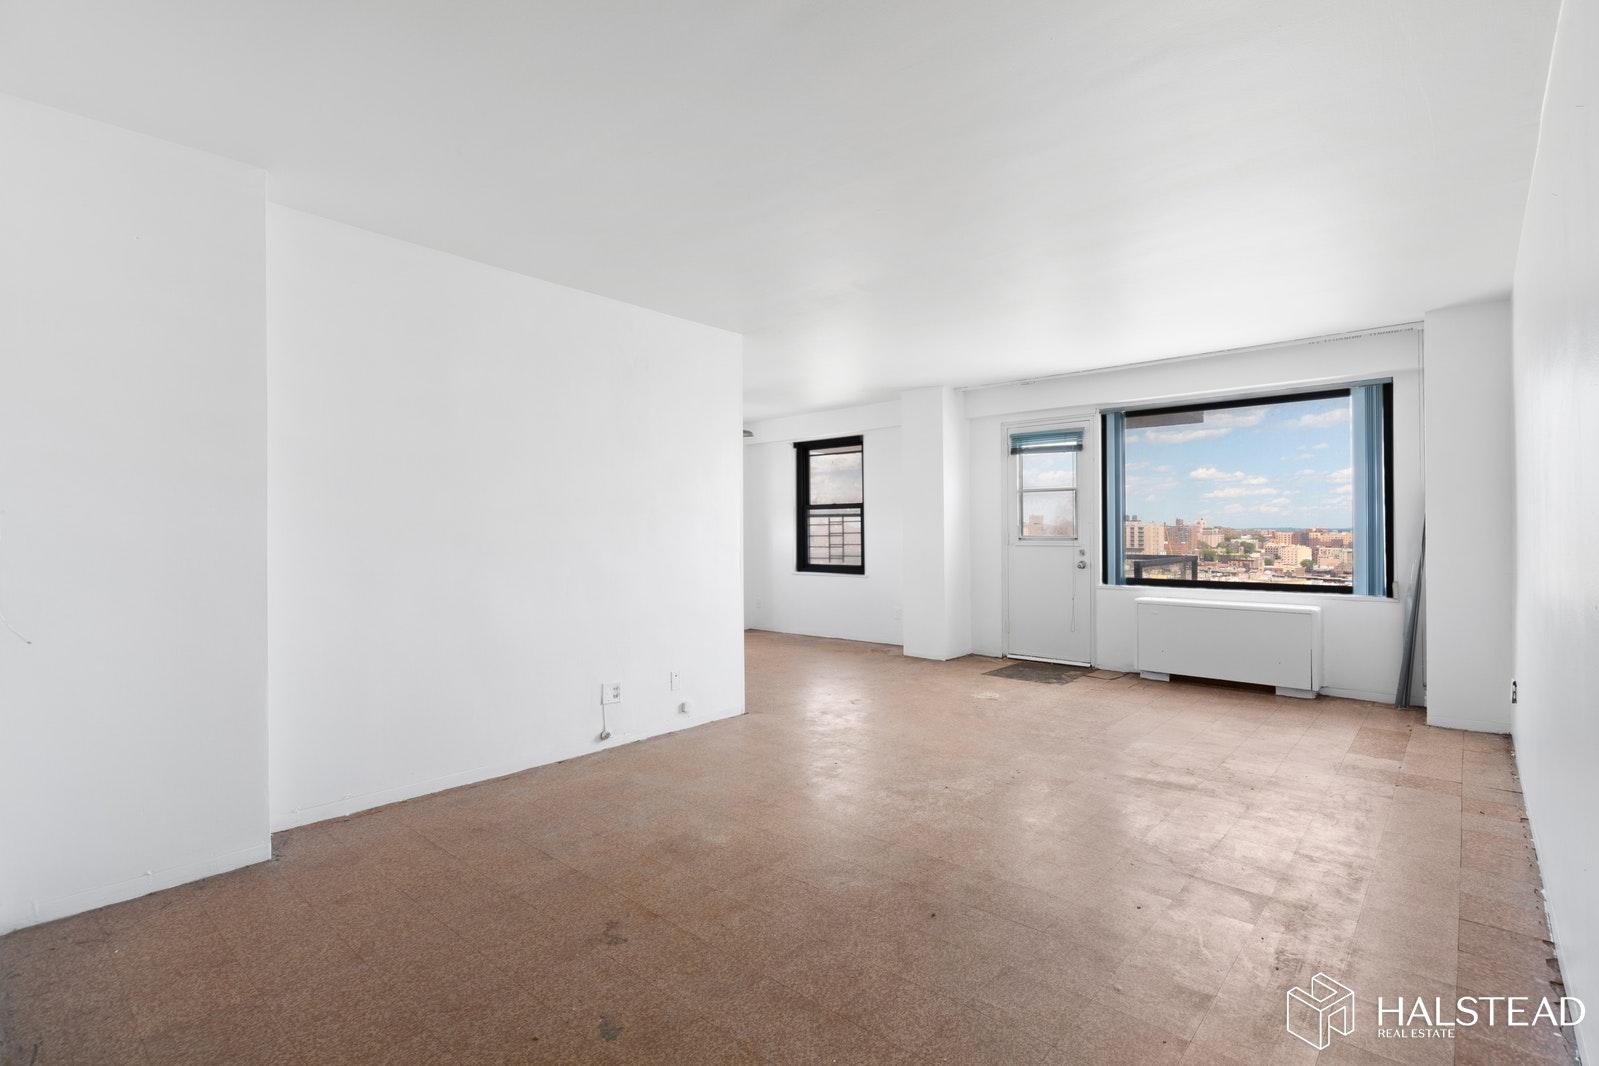 1020 GRAND CONCOURSE, Concourse Village, $455,500, Web #: 19616650